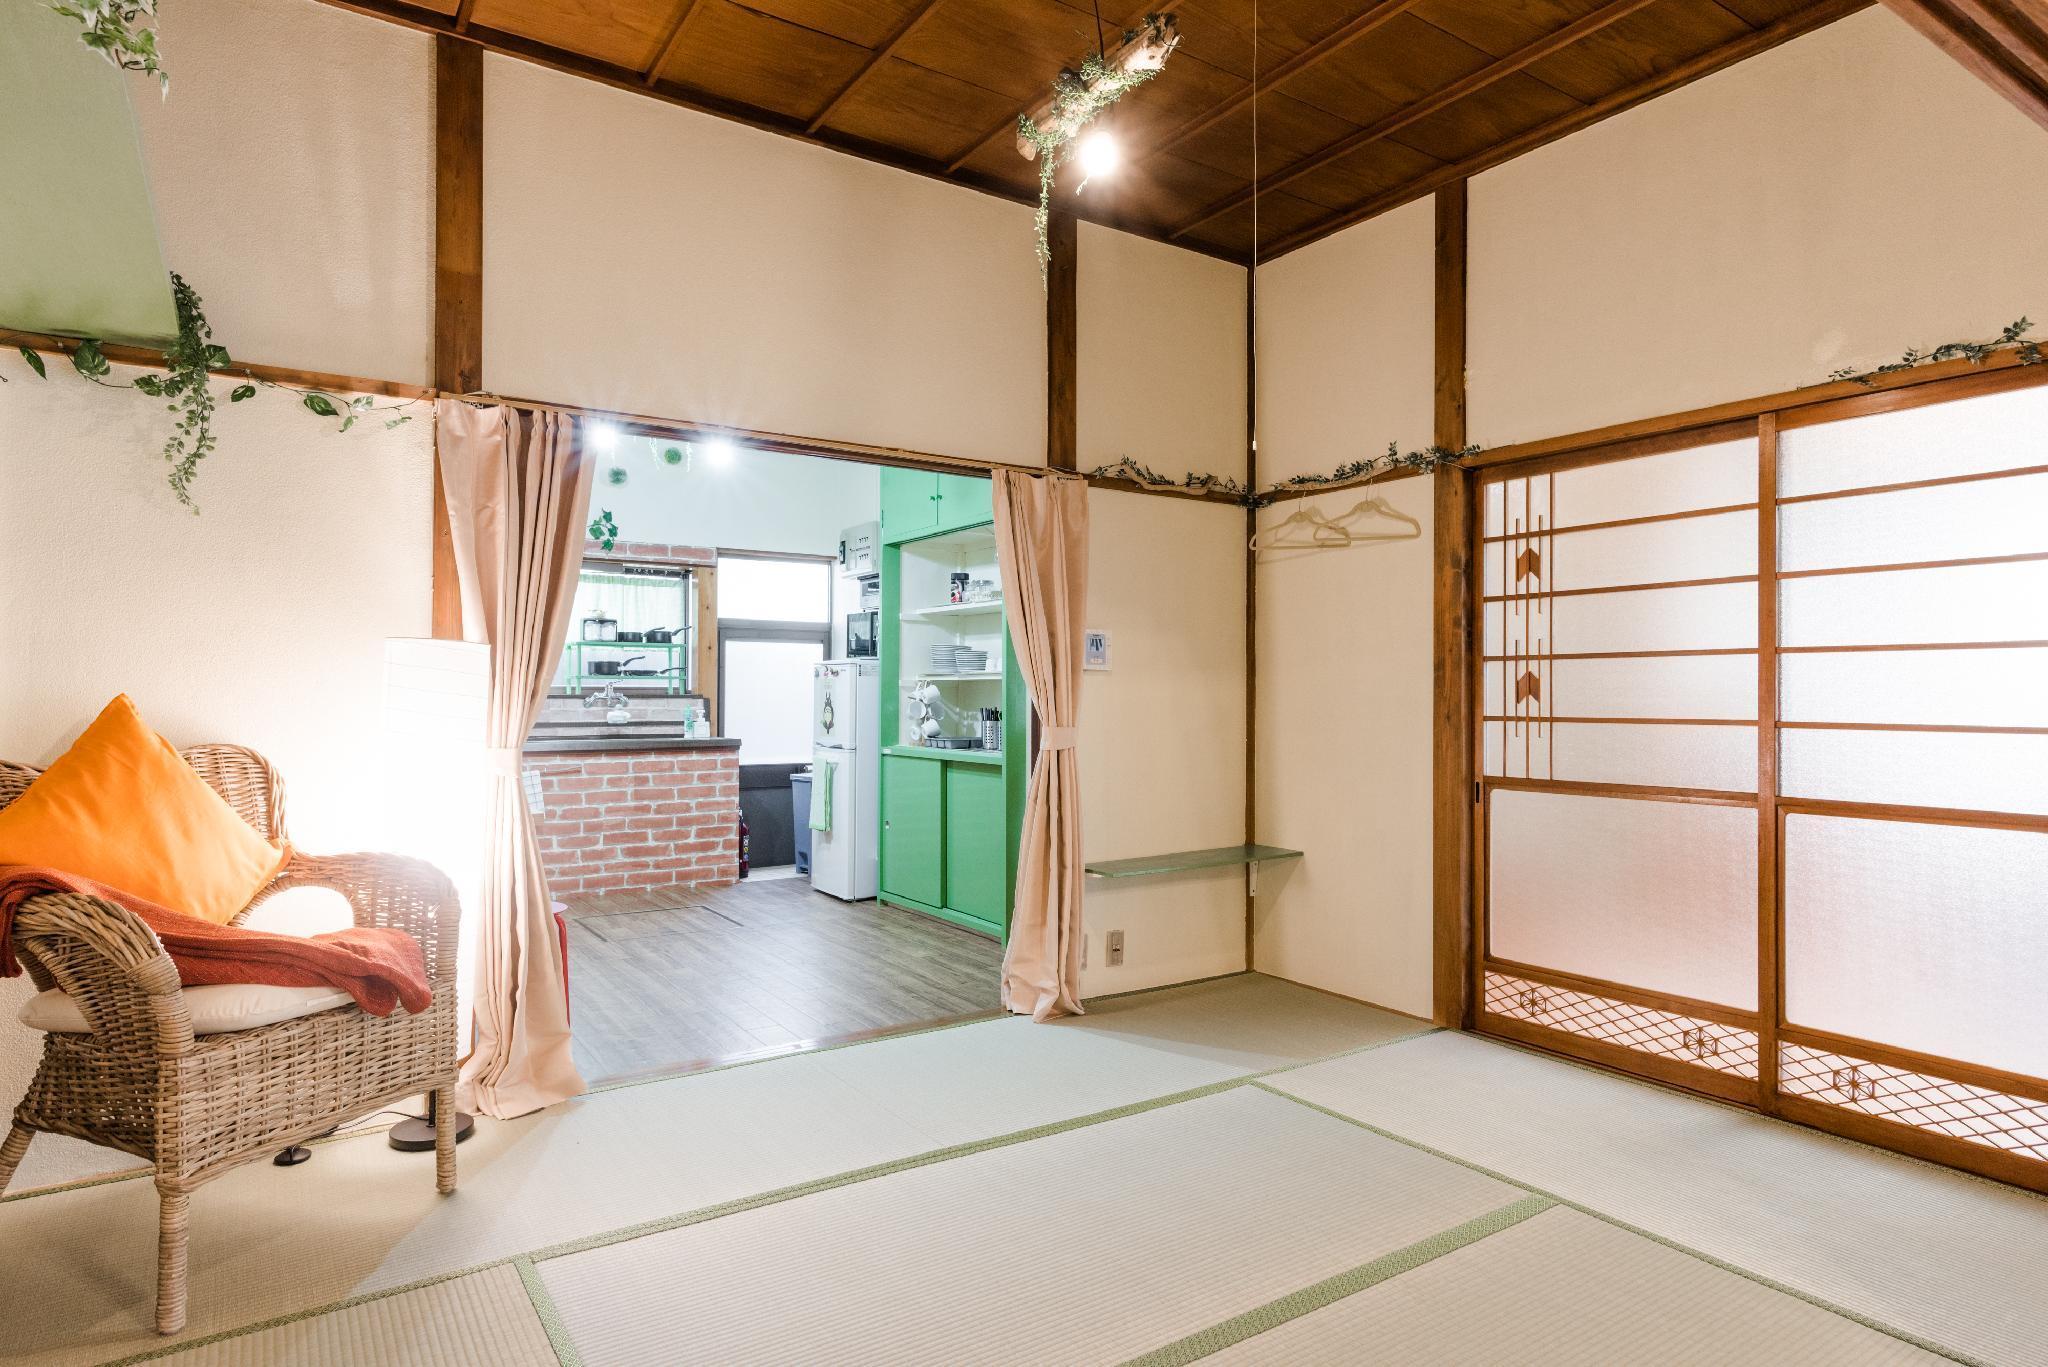 Hakone Ghibli Japanese Traditional House Cable Car